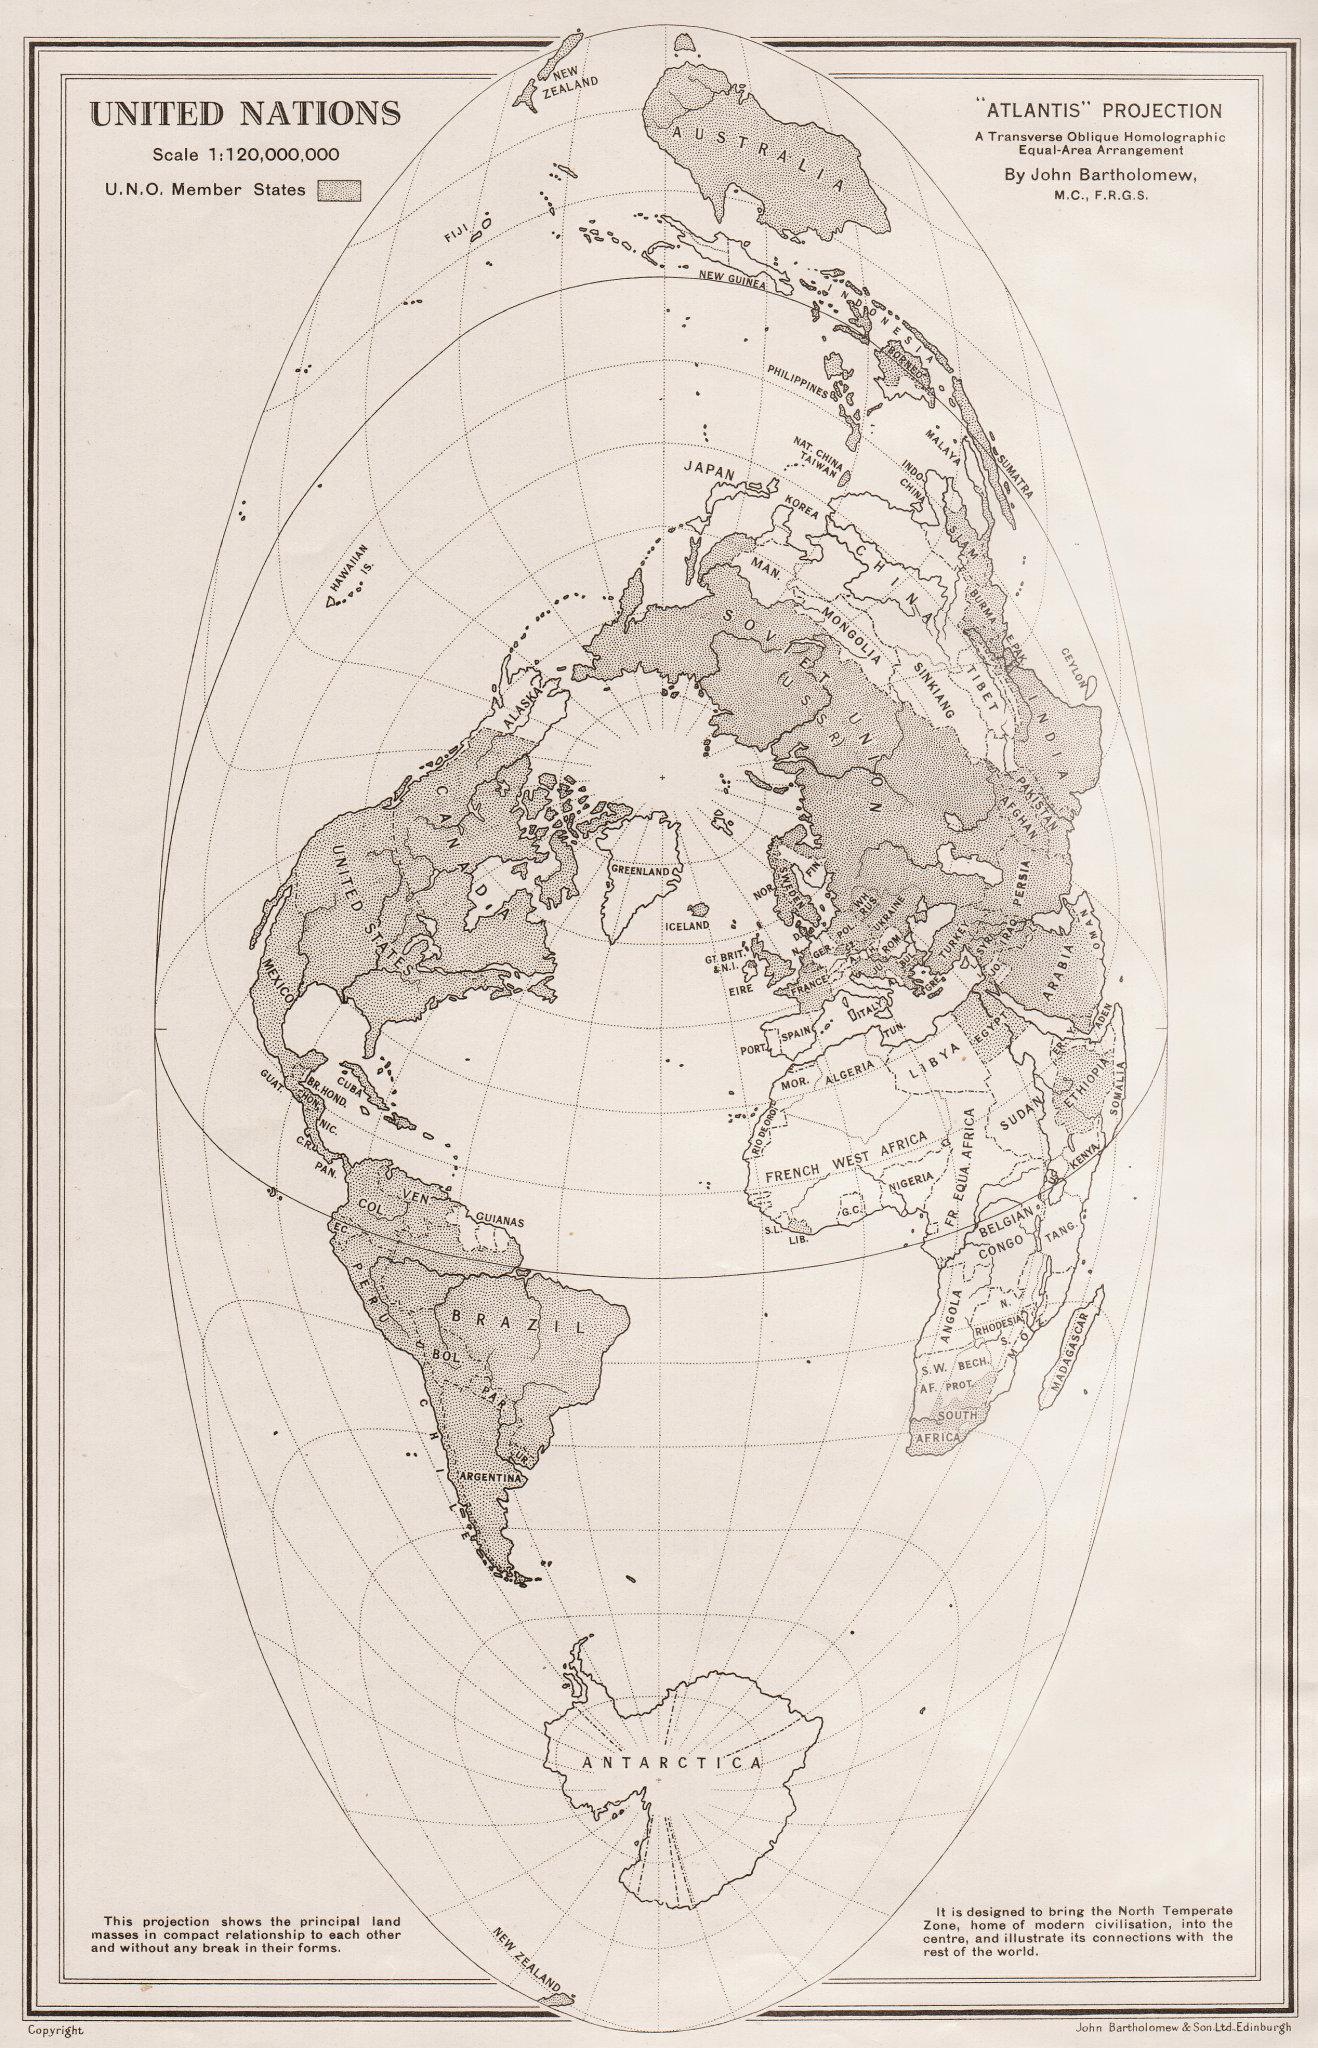 Associate Product WORLD (ATLANTIS PROJECTION) . United Nations member states. BARTHOLOMEW 1952 map